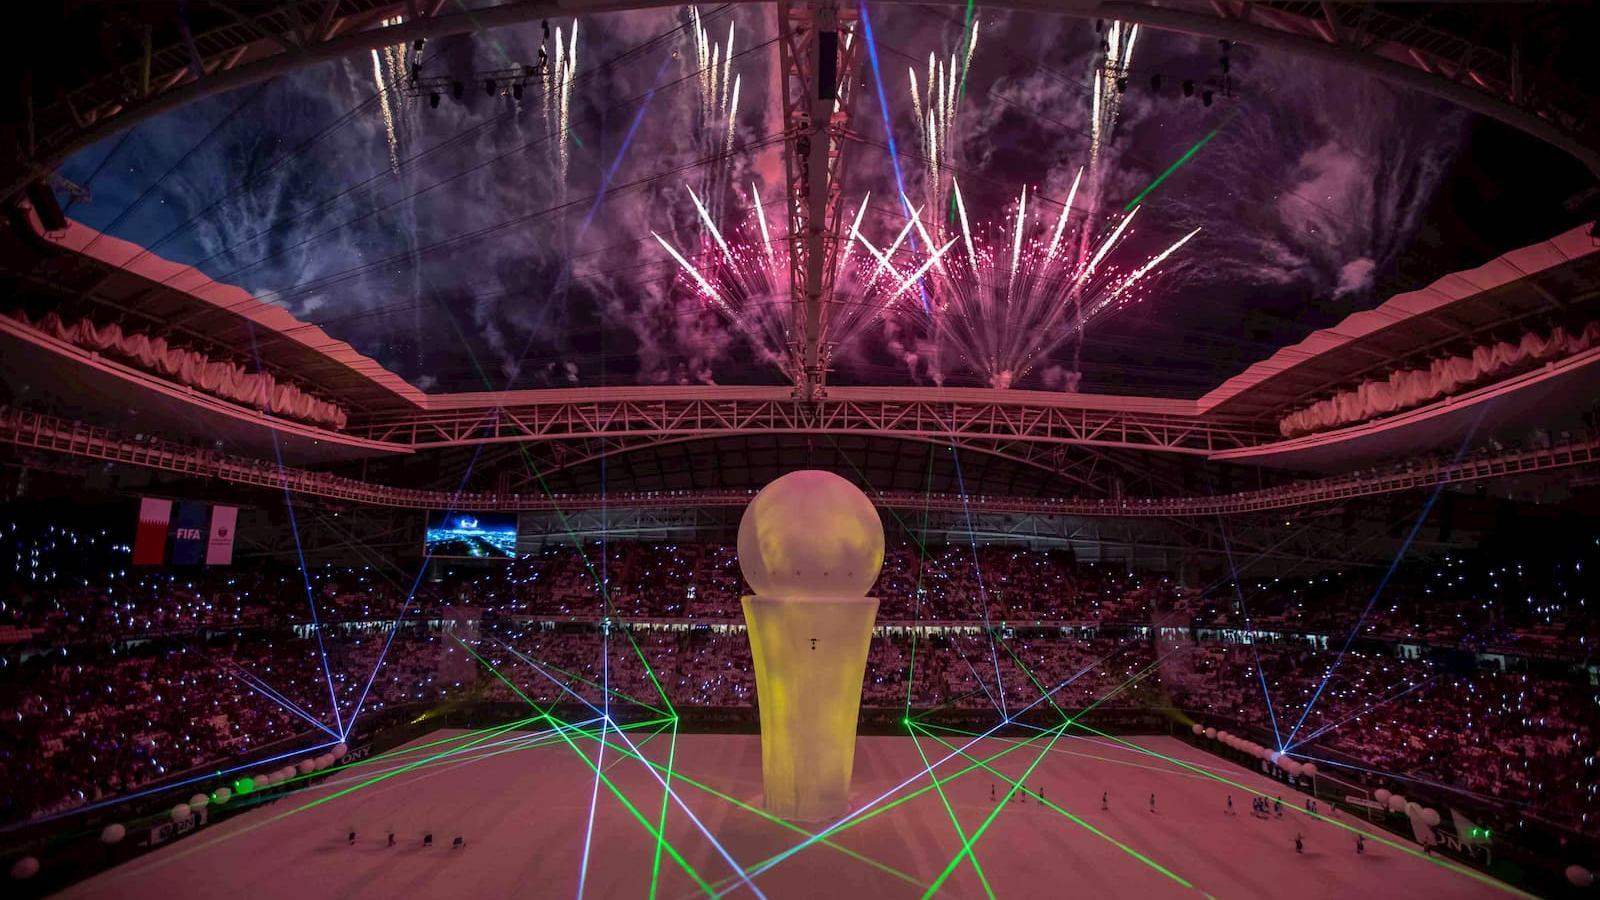 Qatar 2022 World Cup logo to be displayed around the world